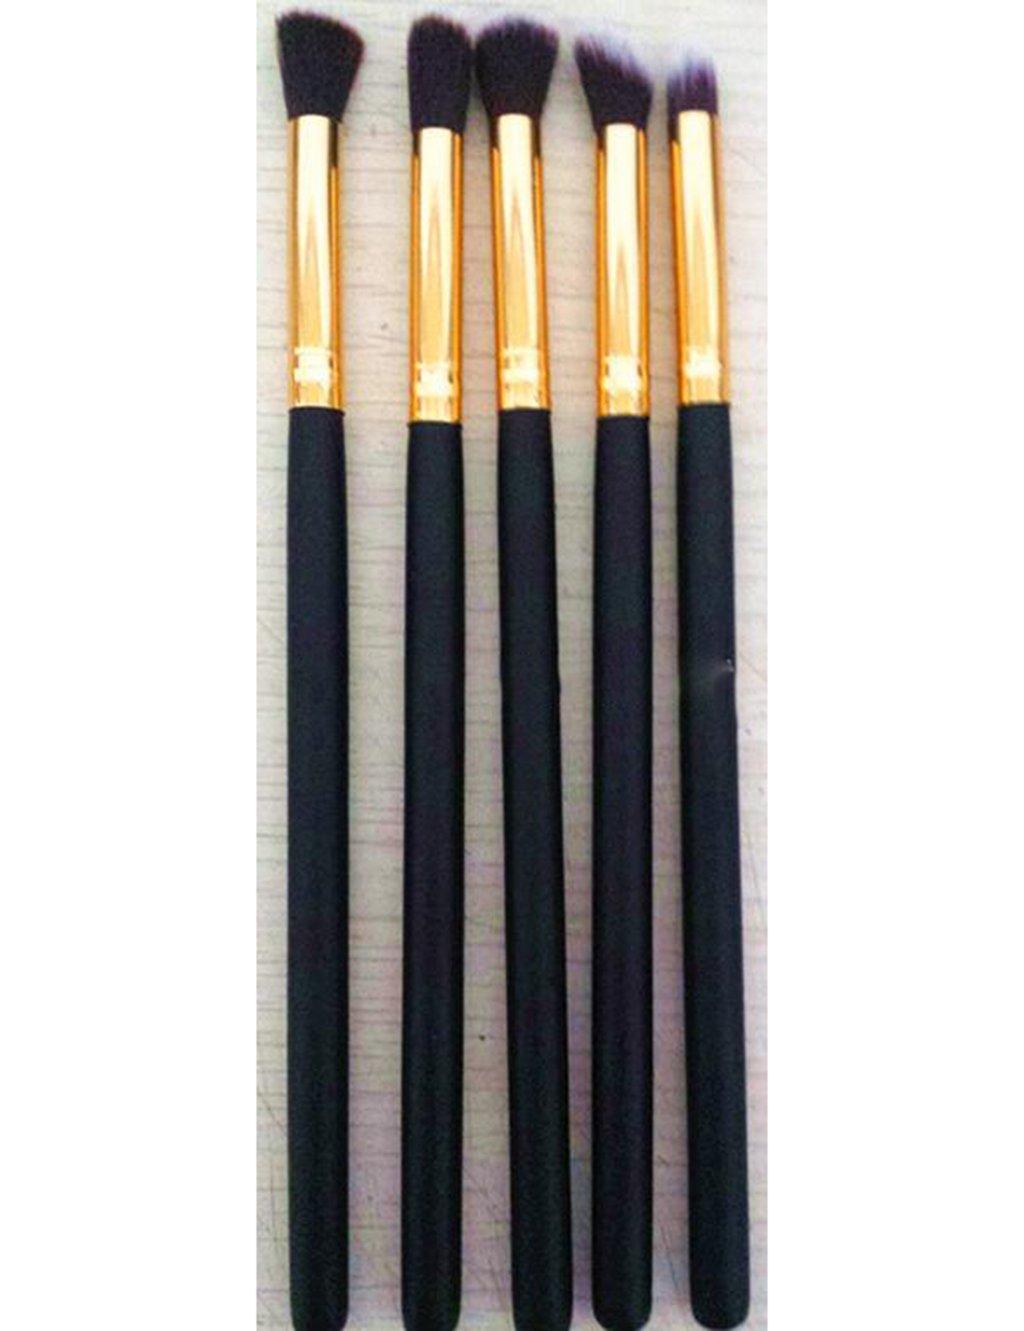 Five brushes gold powder paint black specular brush brush painting beauty makeup kit